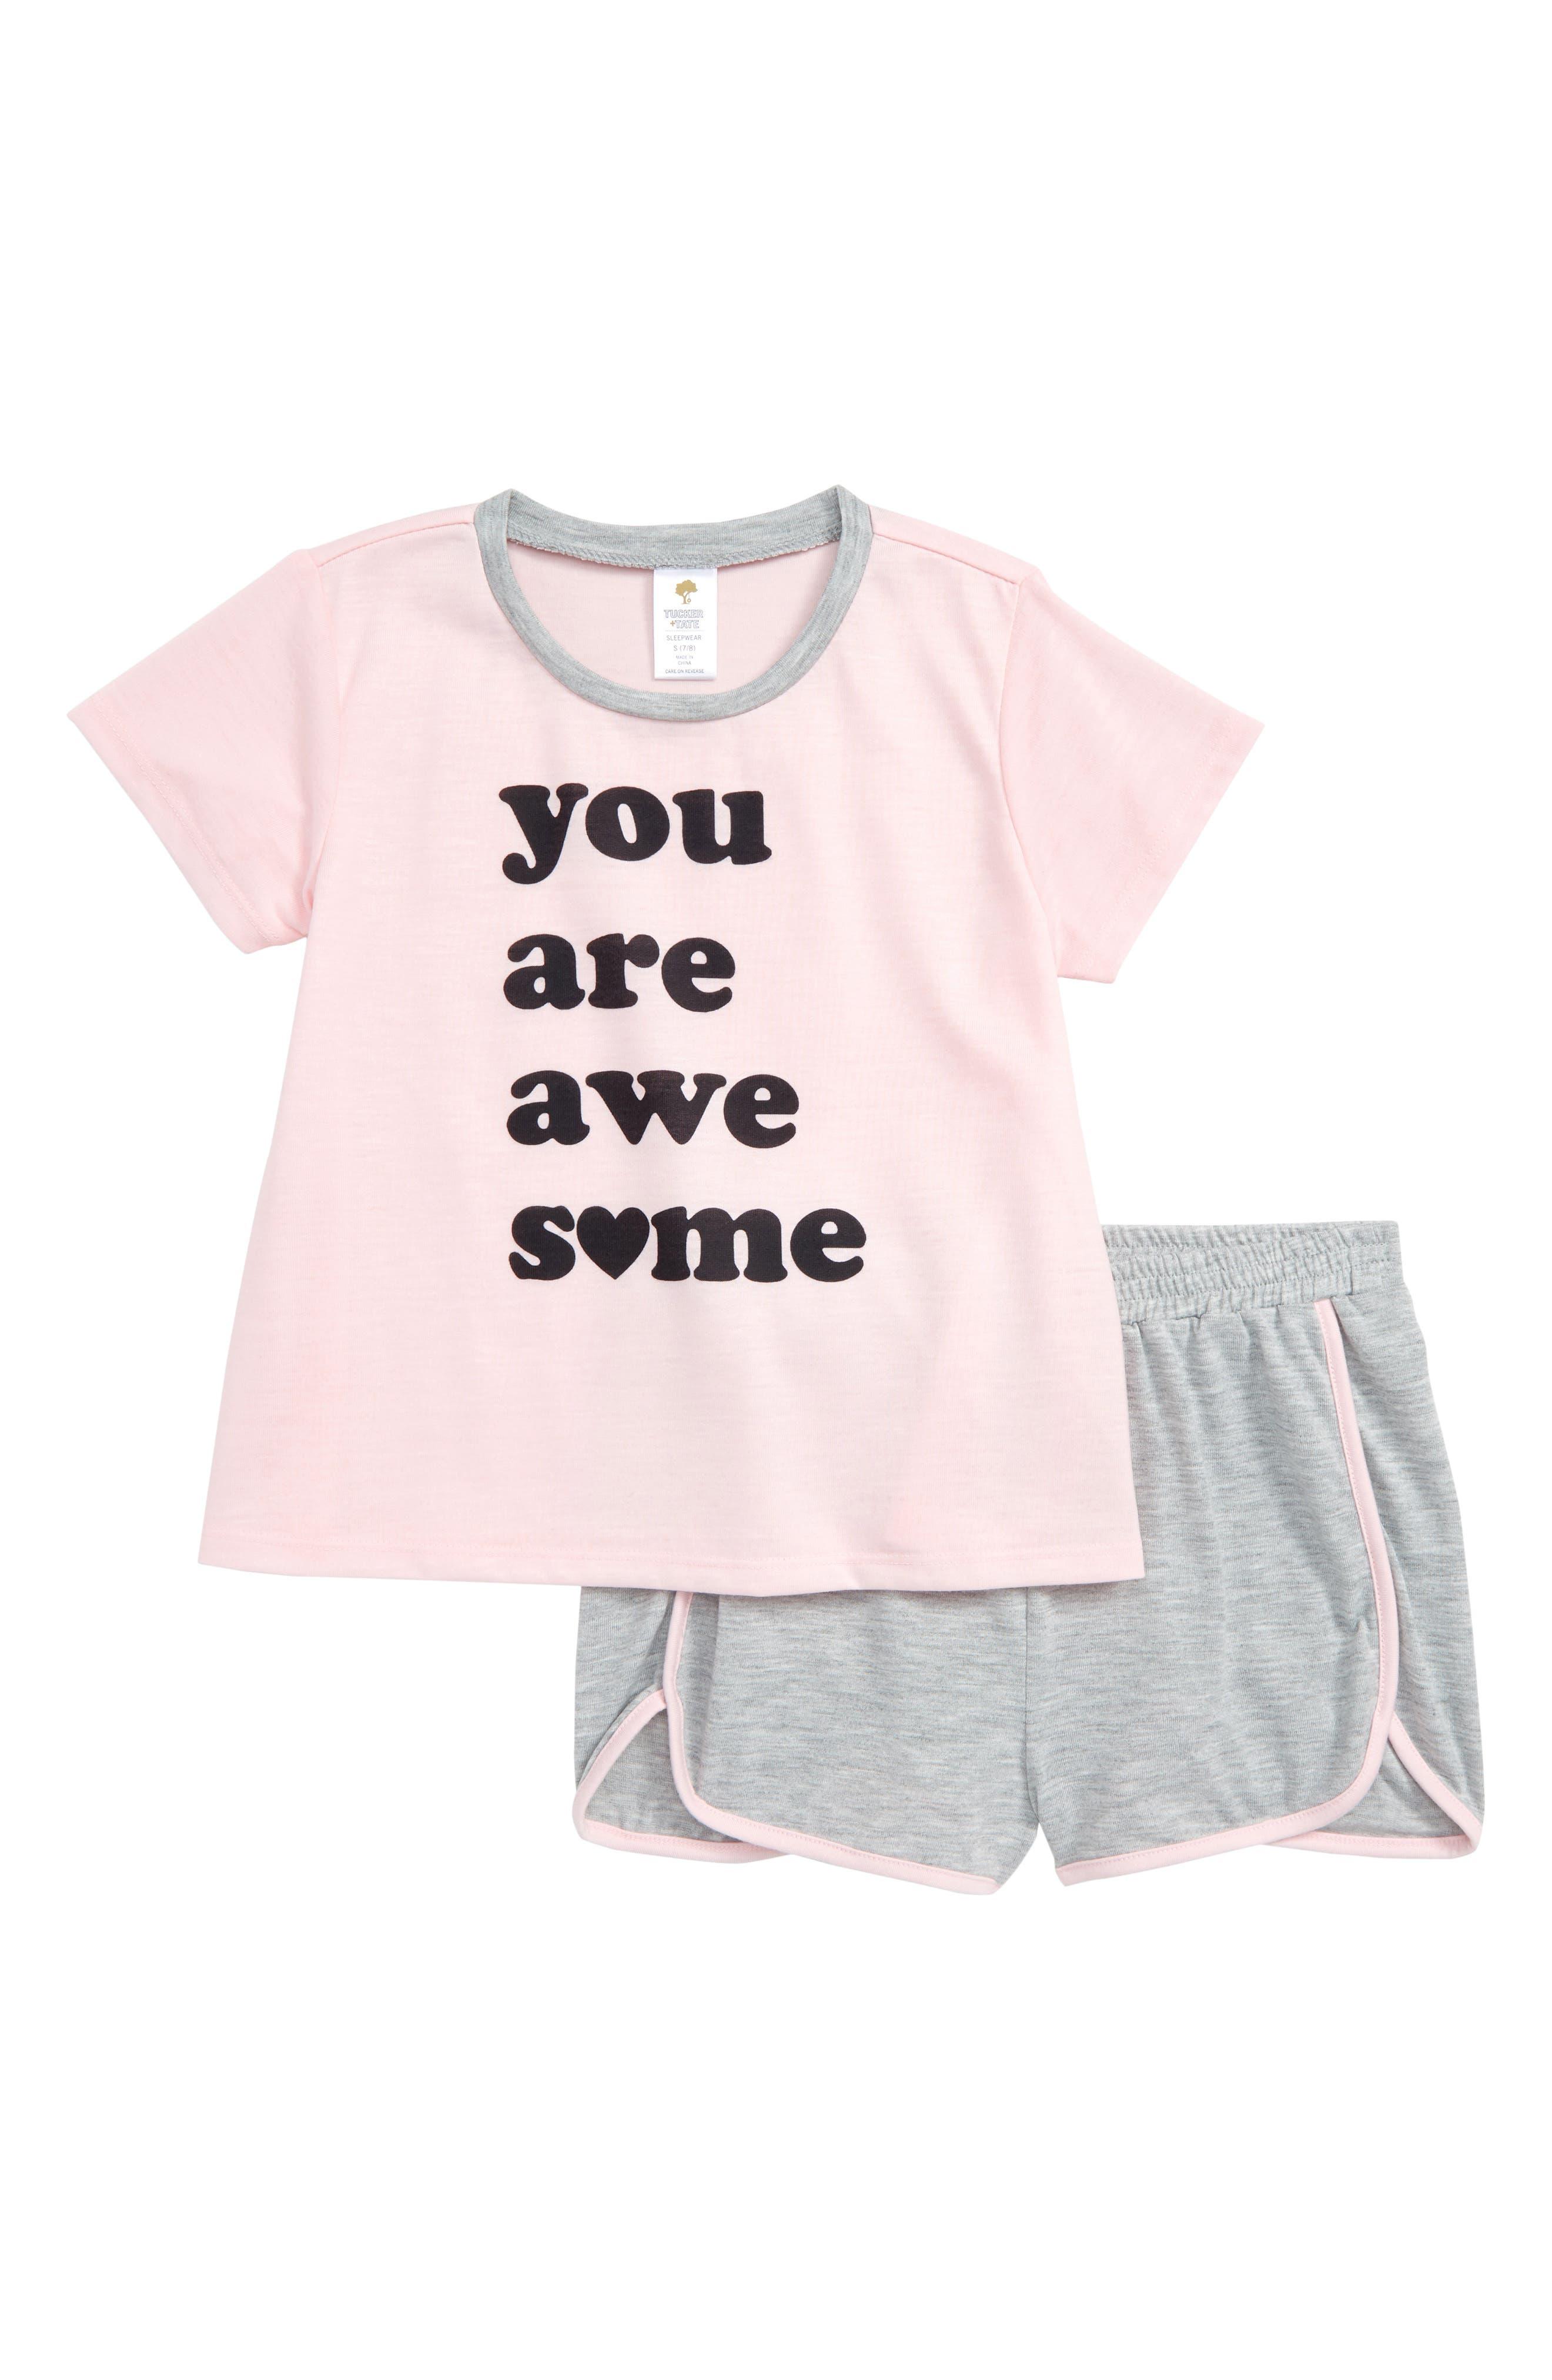 Girls Tucker  Tate TwoPiece Pajamas Size S (78)  Ivory